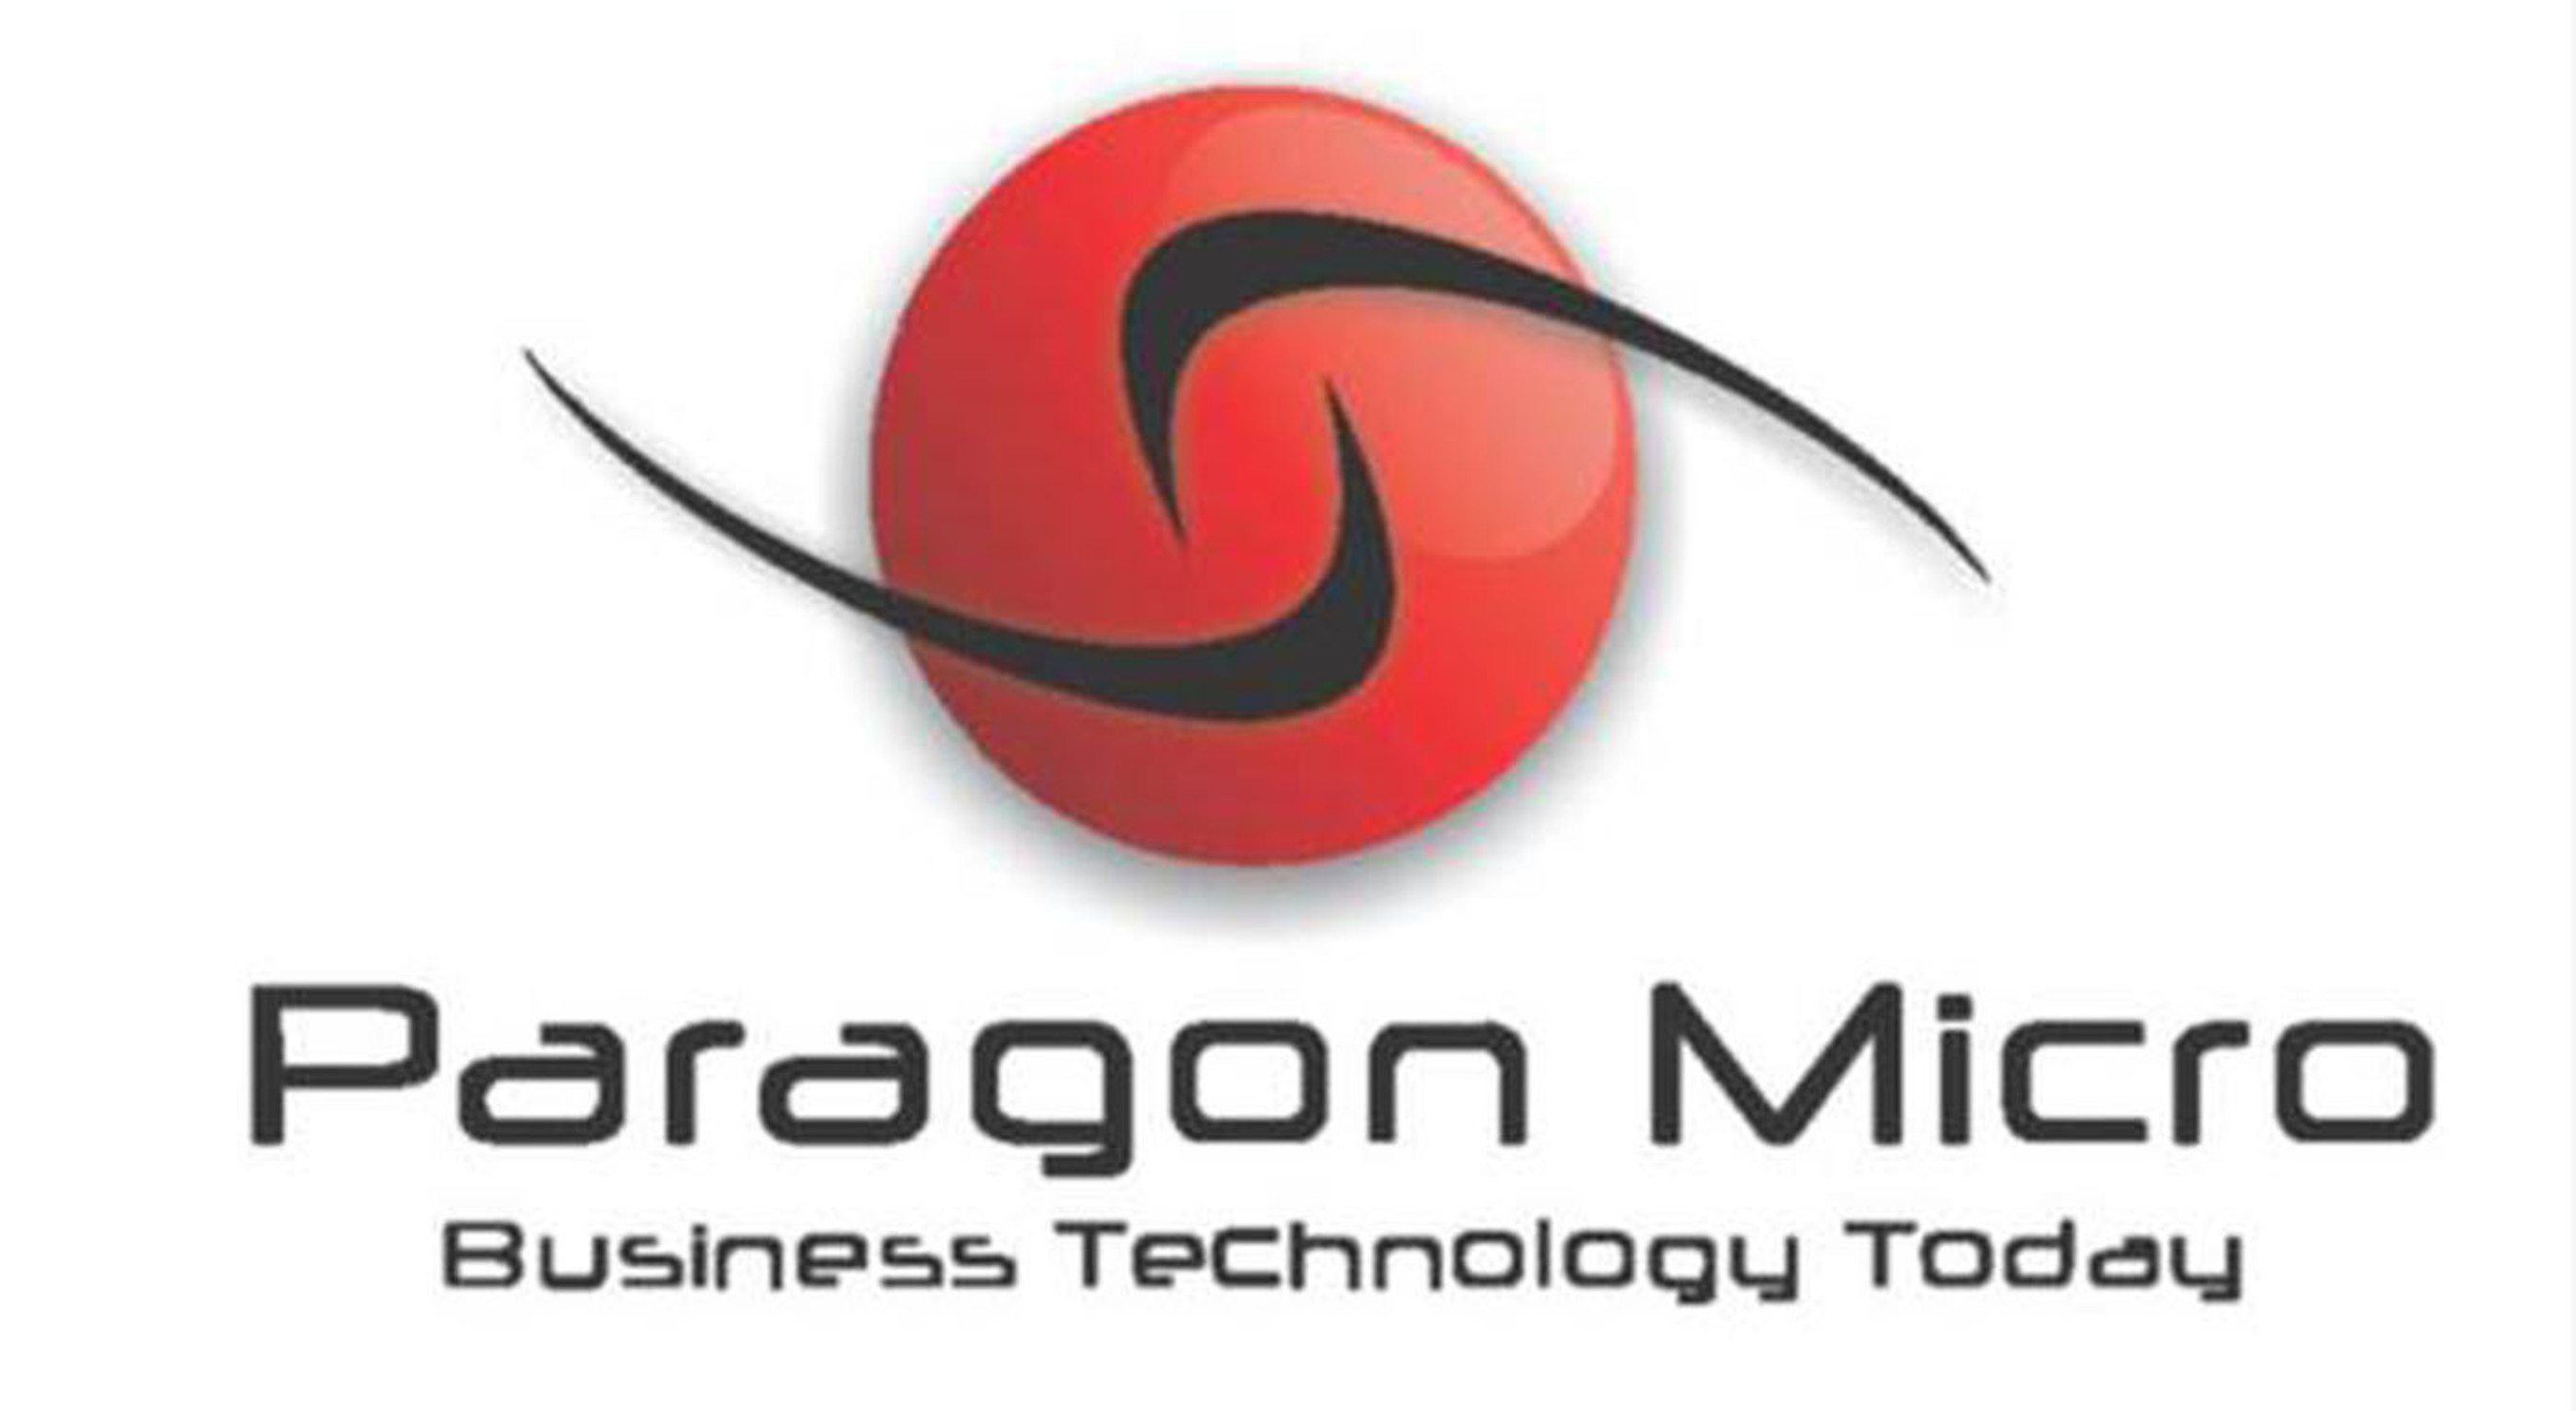 Paragon Micro, Inc. Logo. (PRNewsFoto/Paragon Micro, Inc.) (PRNewsFoto/)